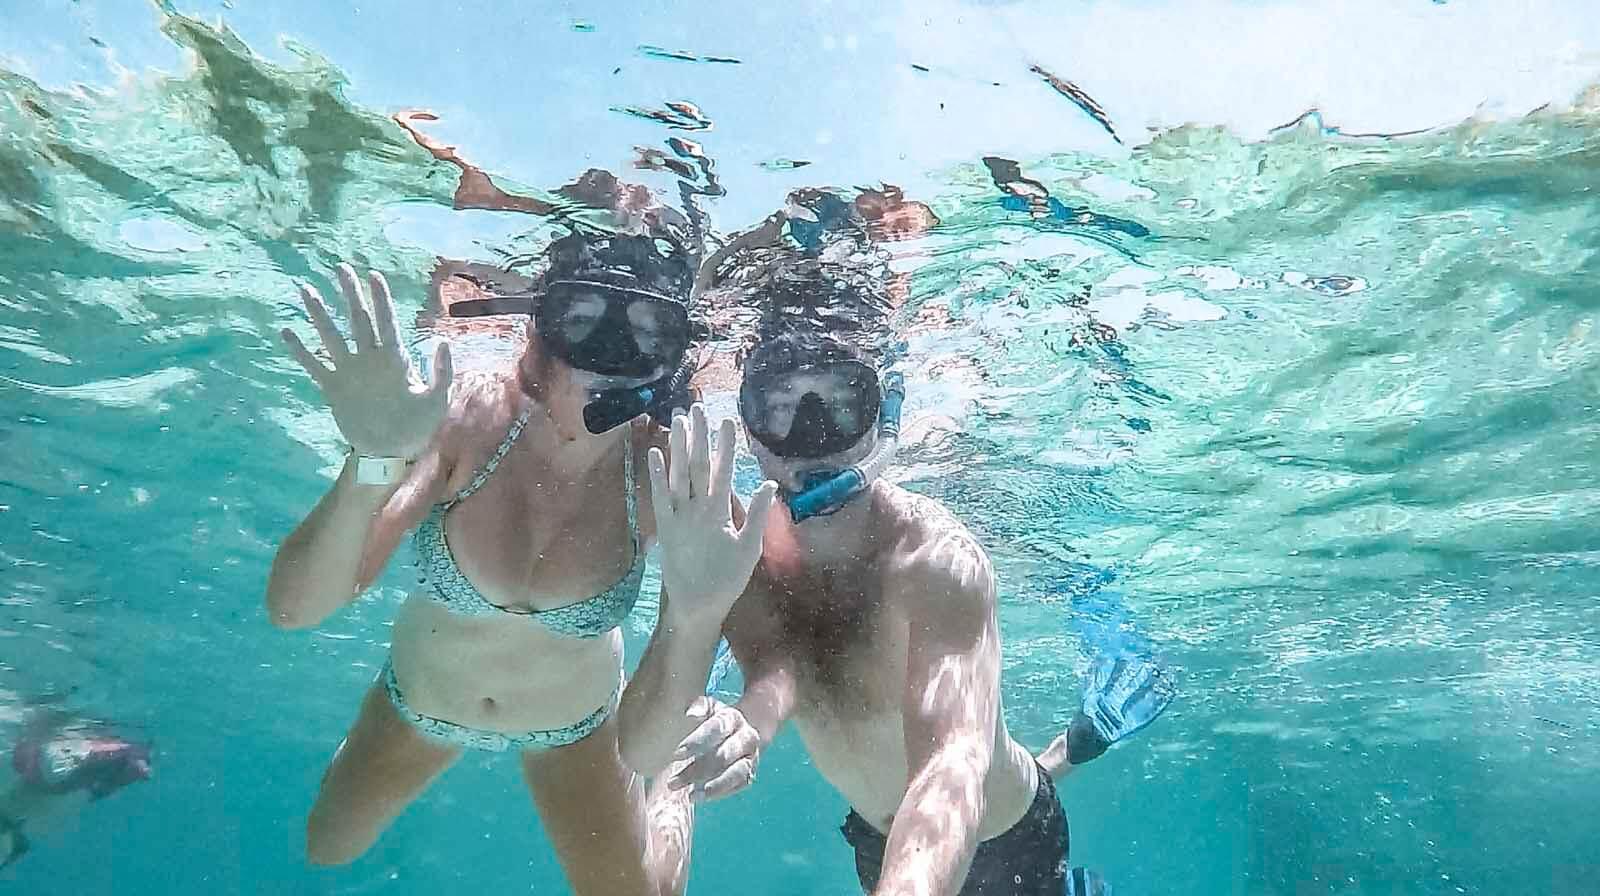 Snorkeling at Hol Chan Marine Reserve Belize